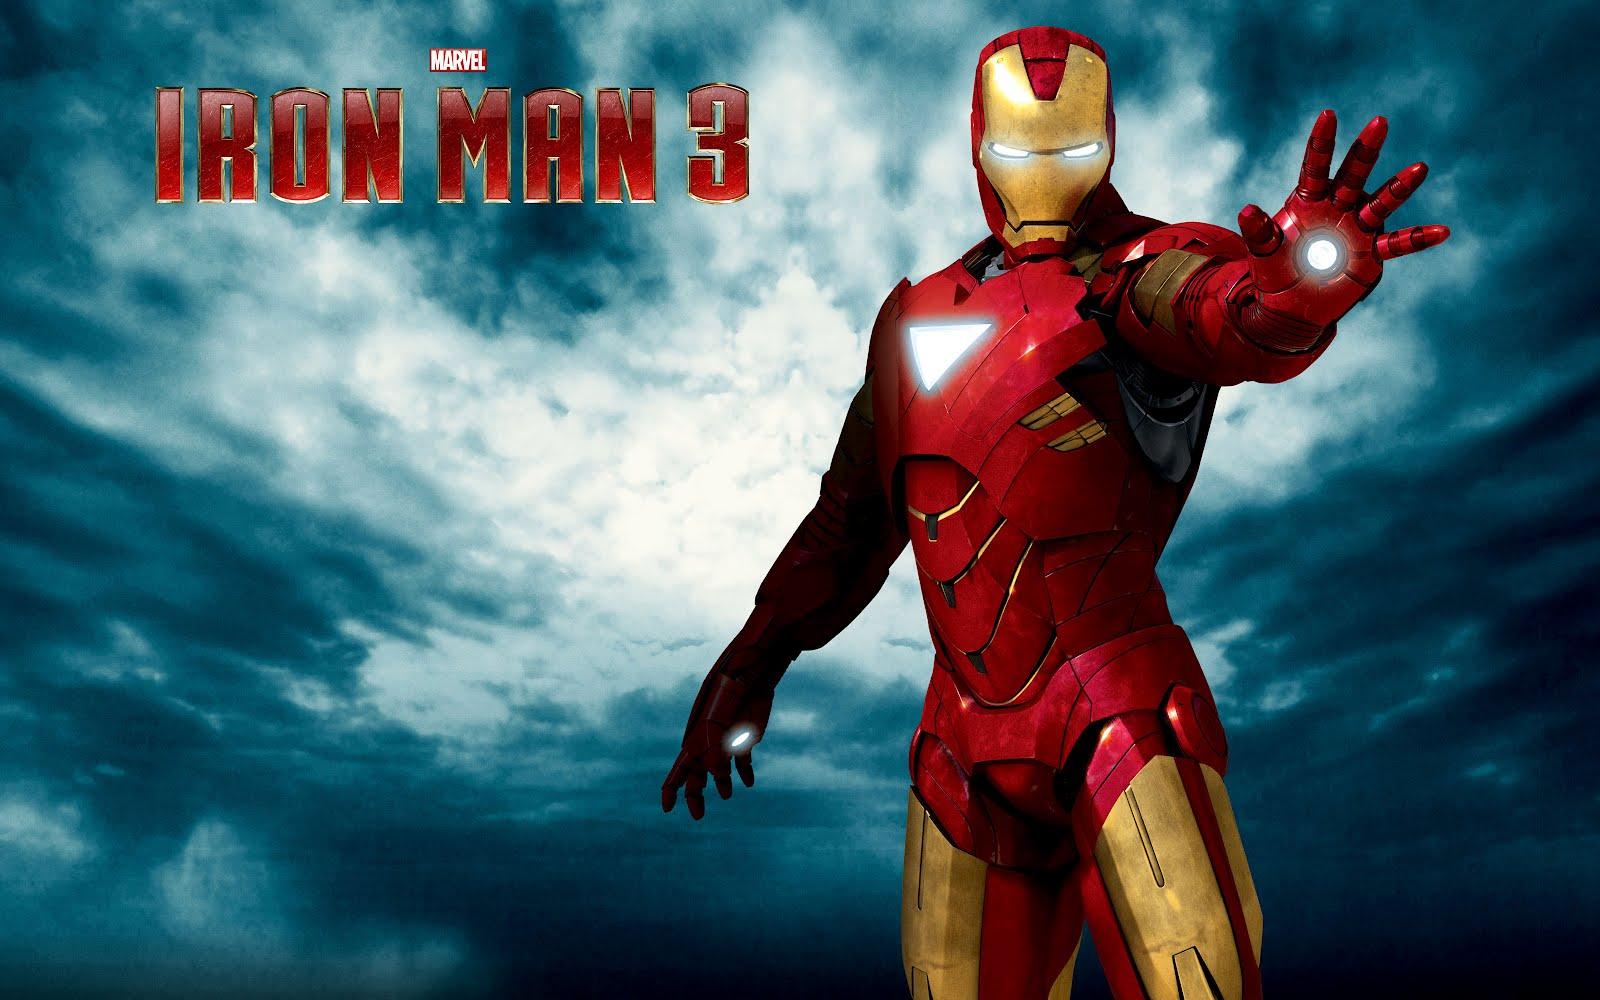 Tony Stark - Ironman